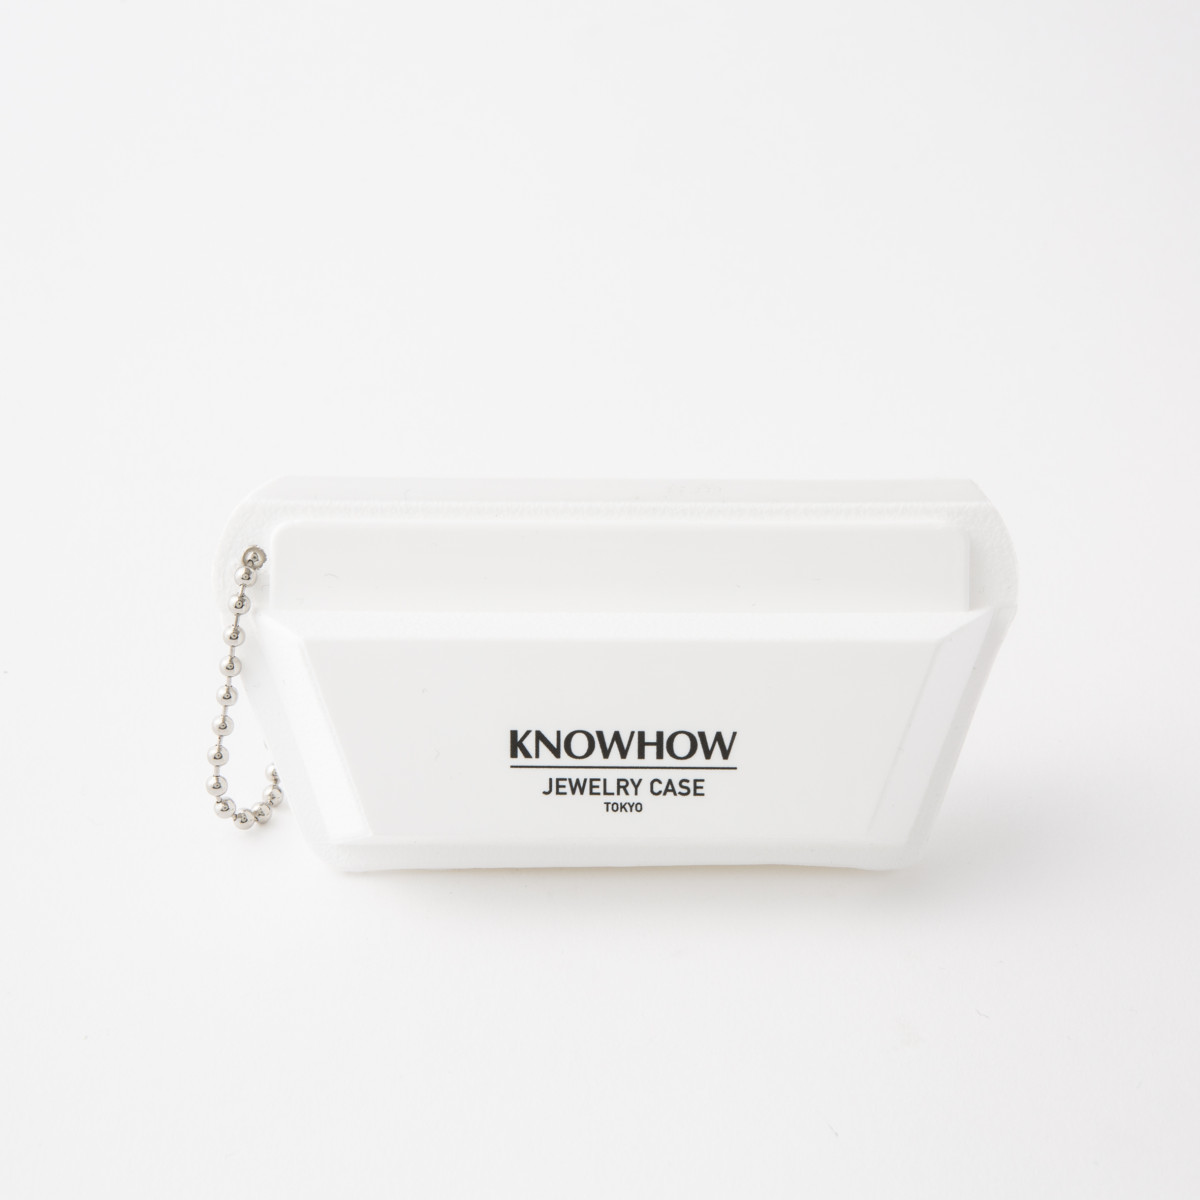 迚ゥ謦ョ繧頑怙邨・KNOWHOW Jewelry Case